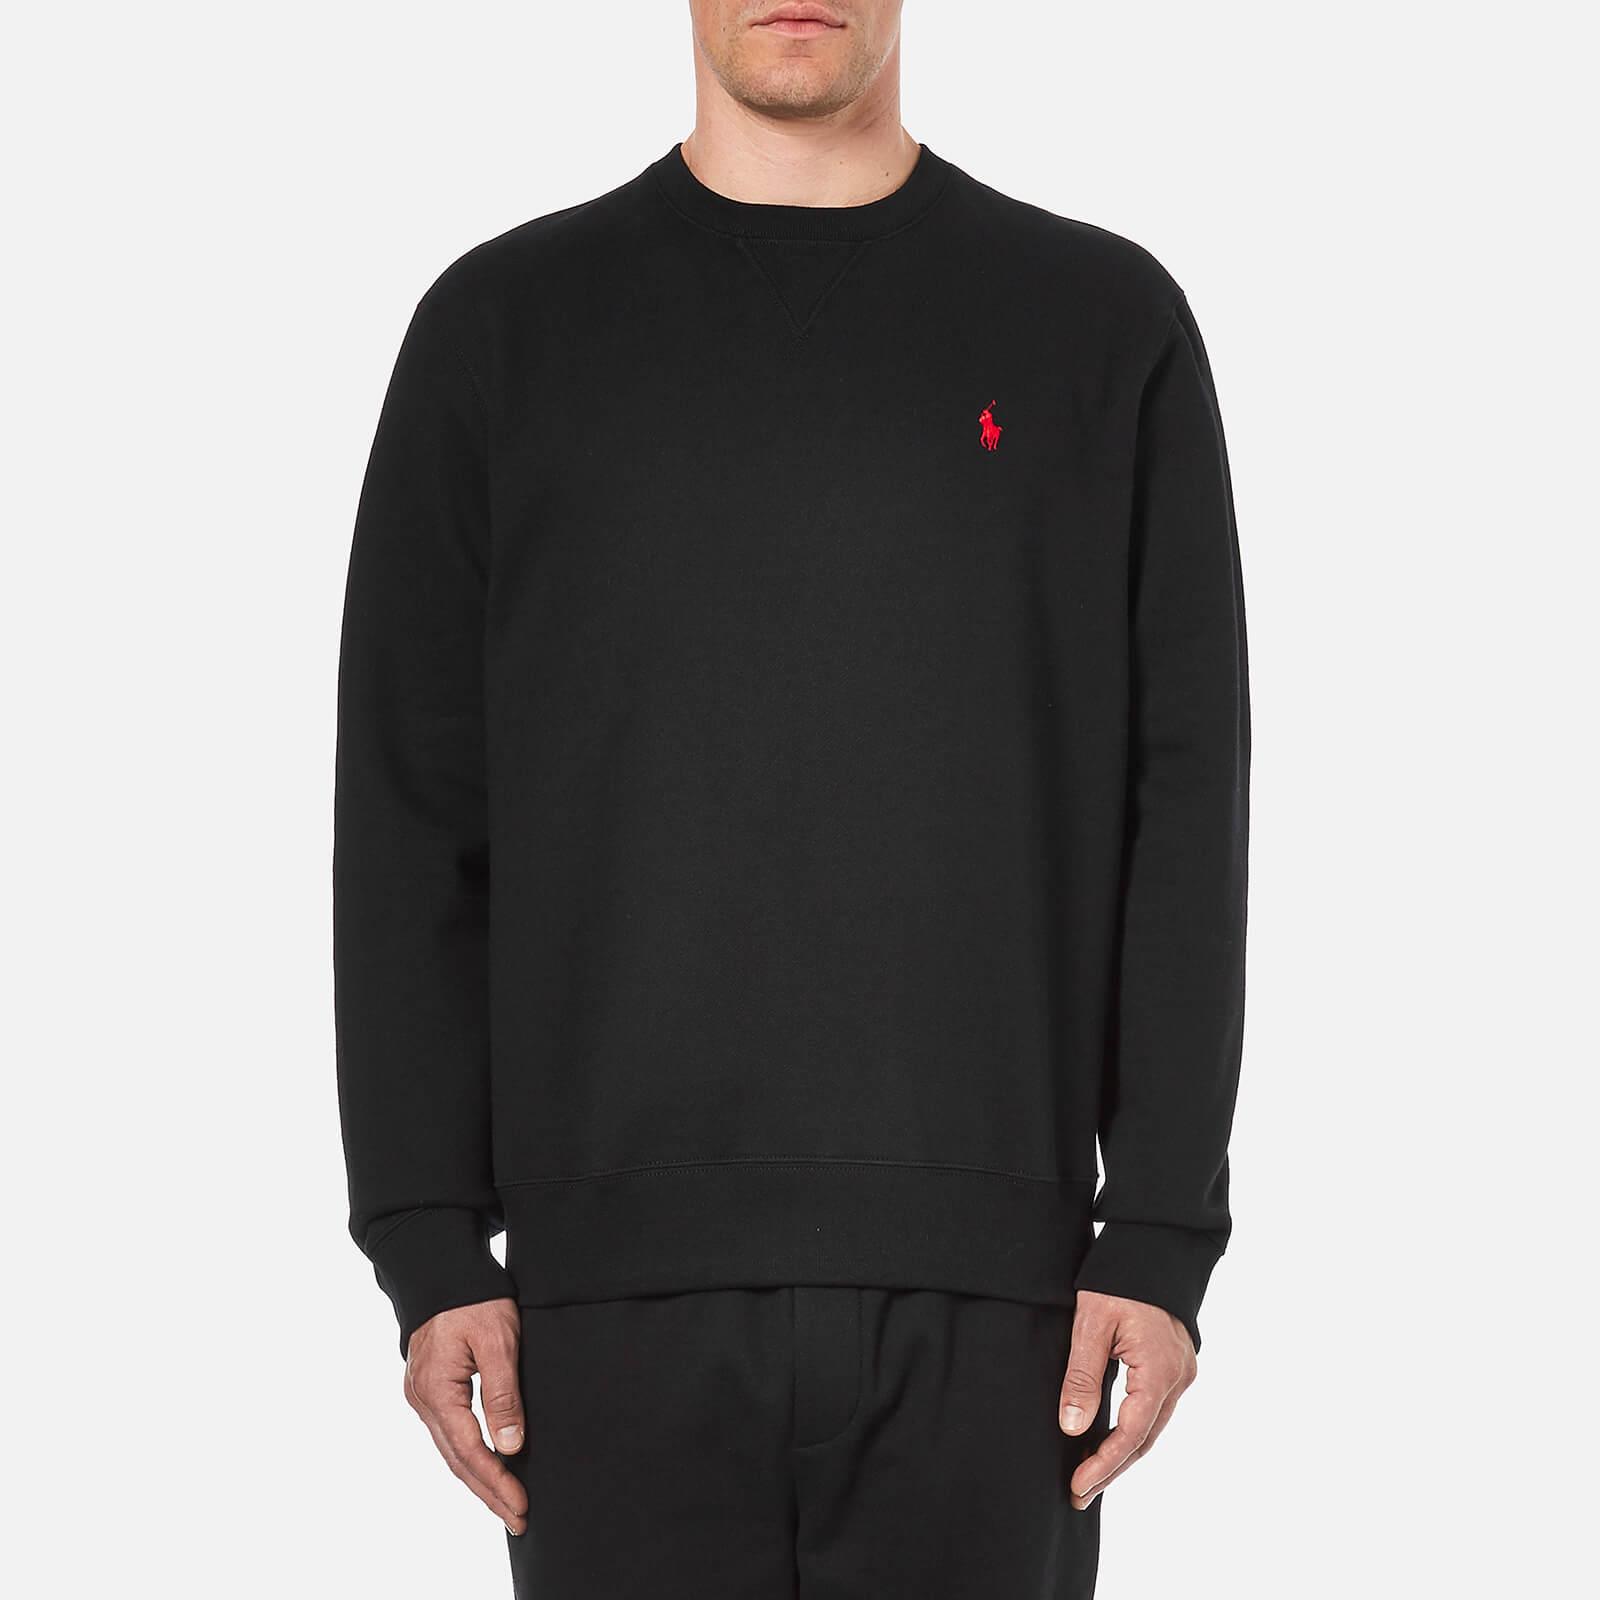 6a5aba302 Polo Ralph Lauren Men's Long Sleeve Crew Neck Sweatshirt - Polo Black -  Free UK Delivery over £50